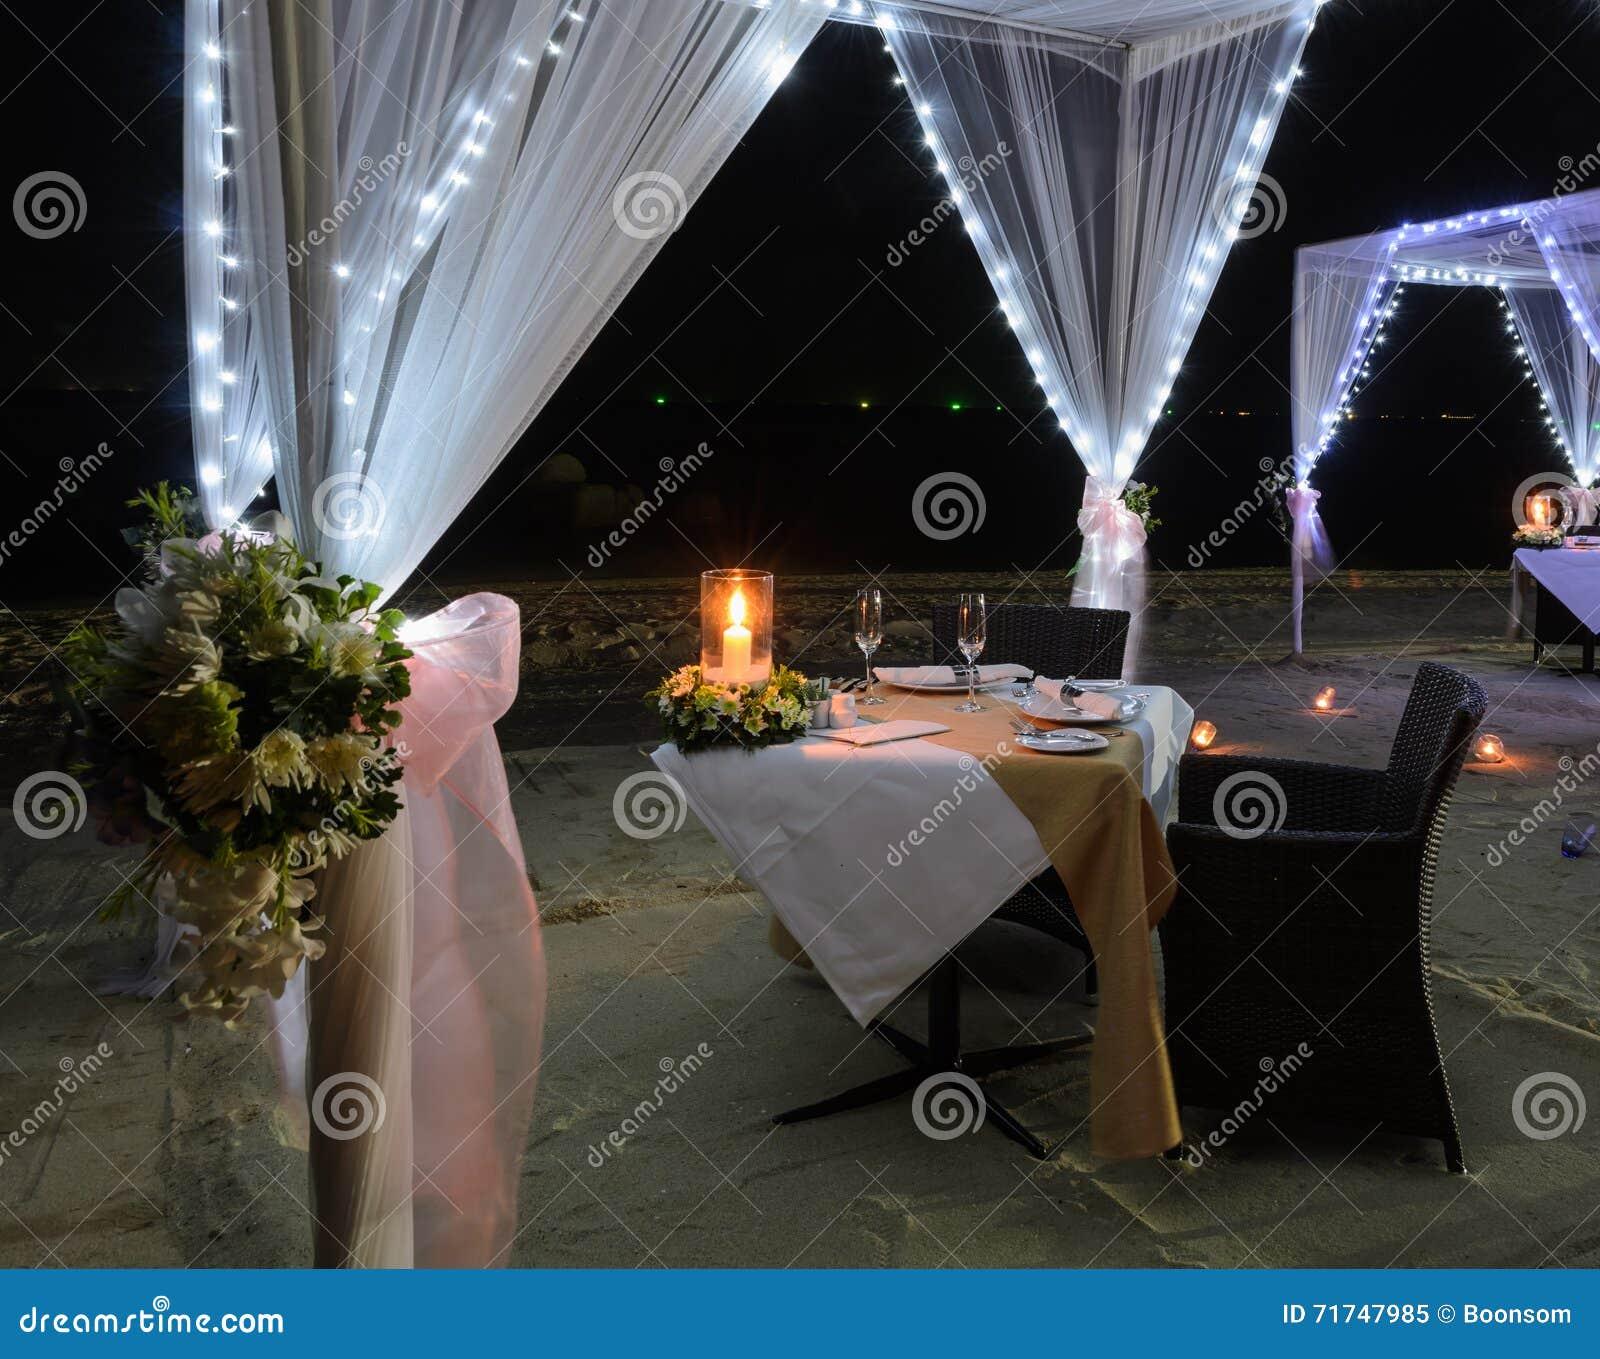 Romantic Dinner Setup On Beach At Night Stock Image